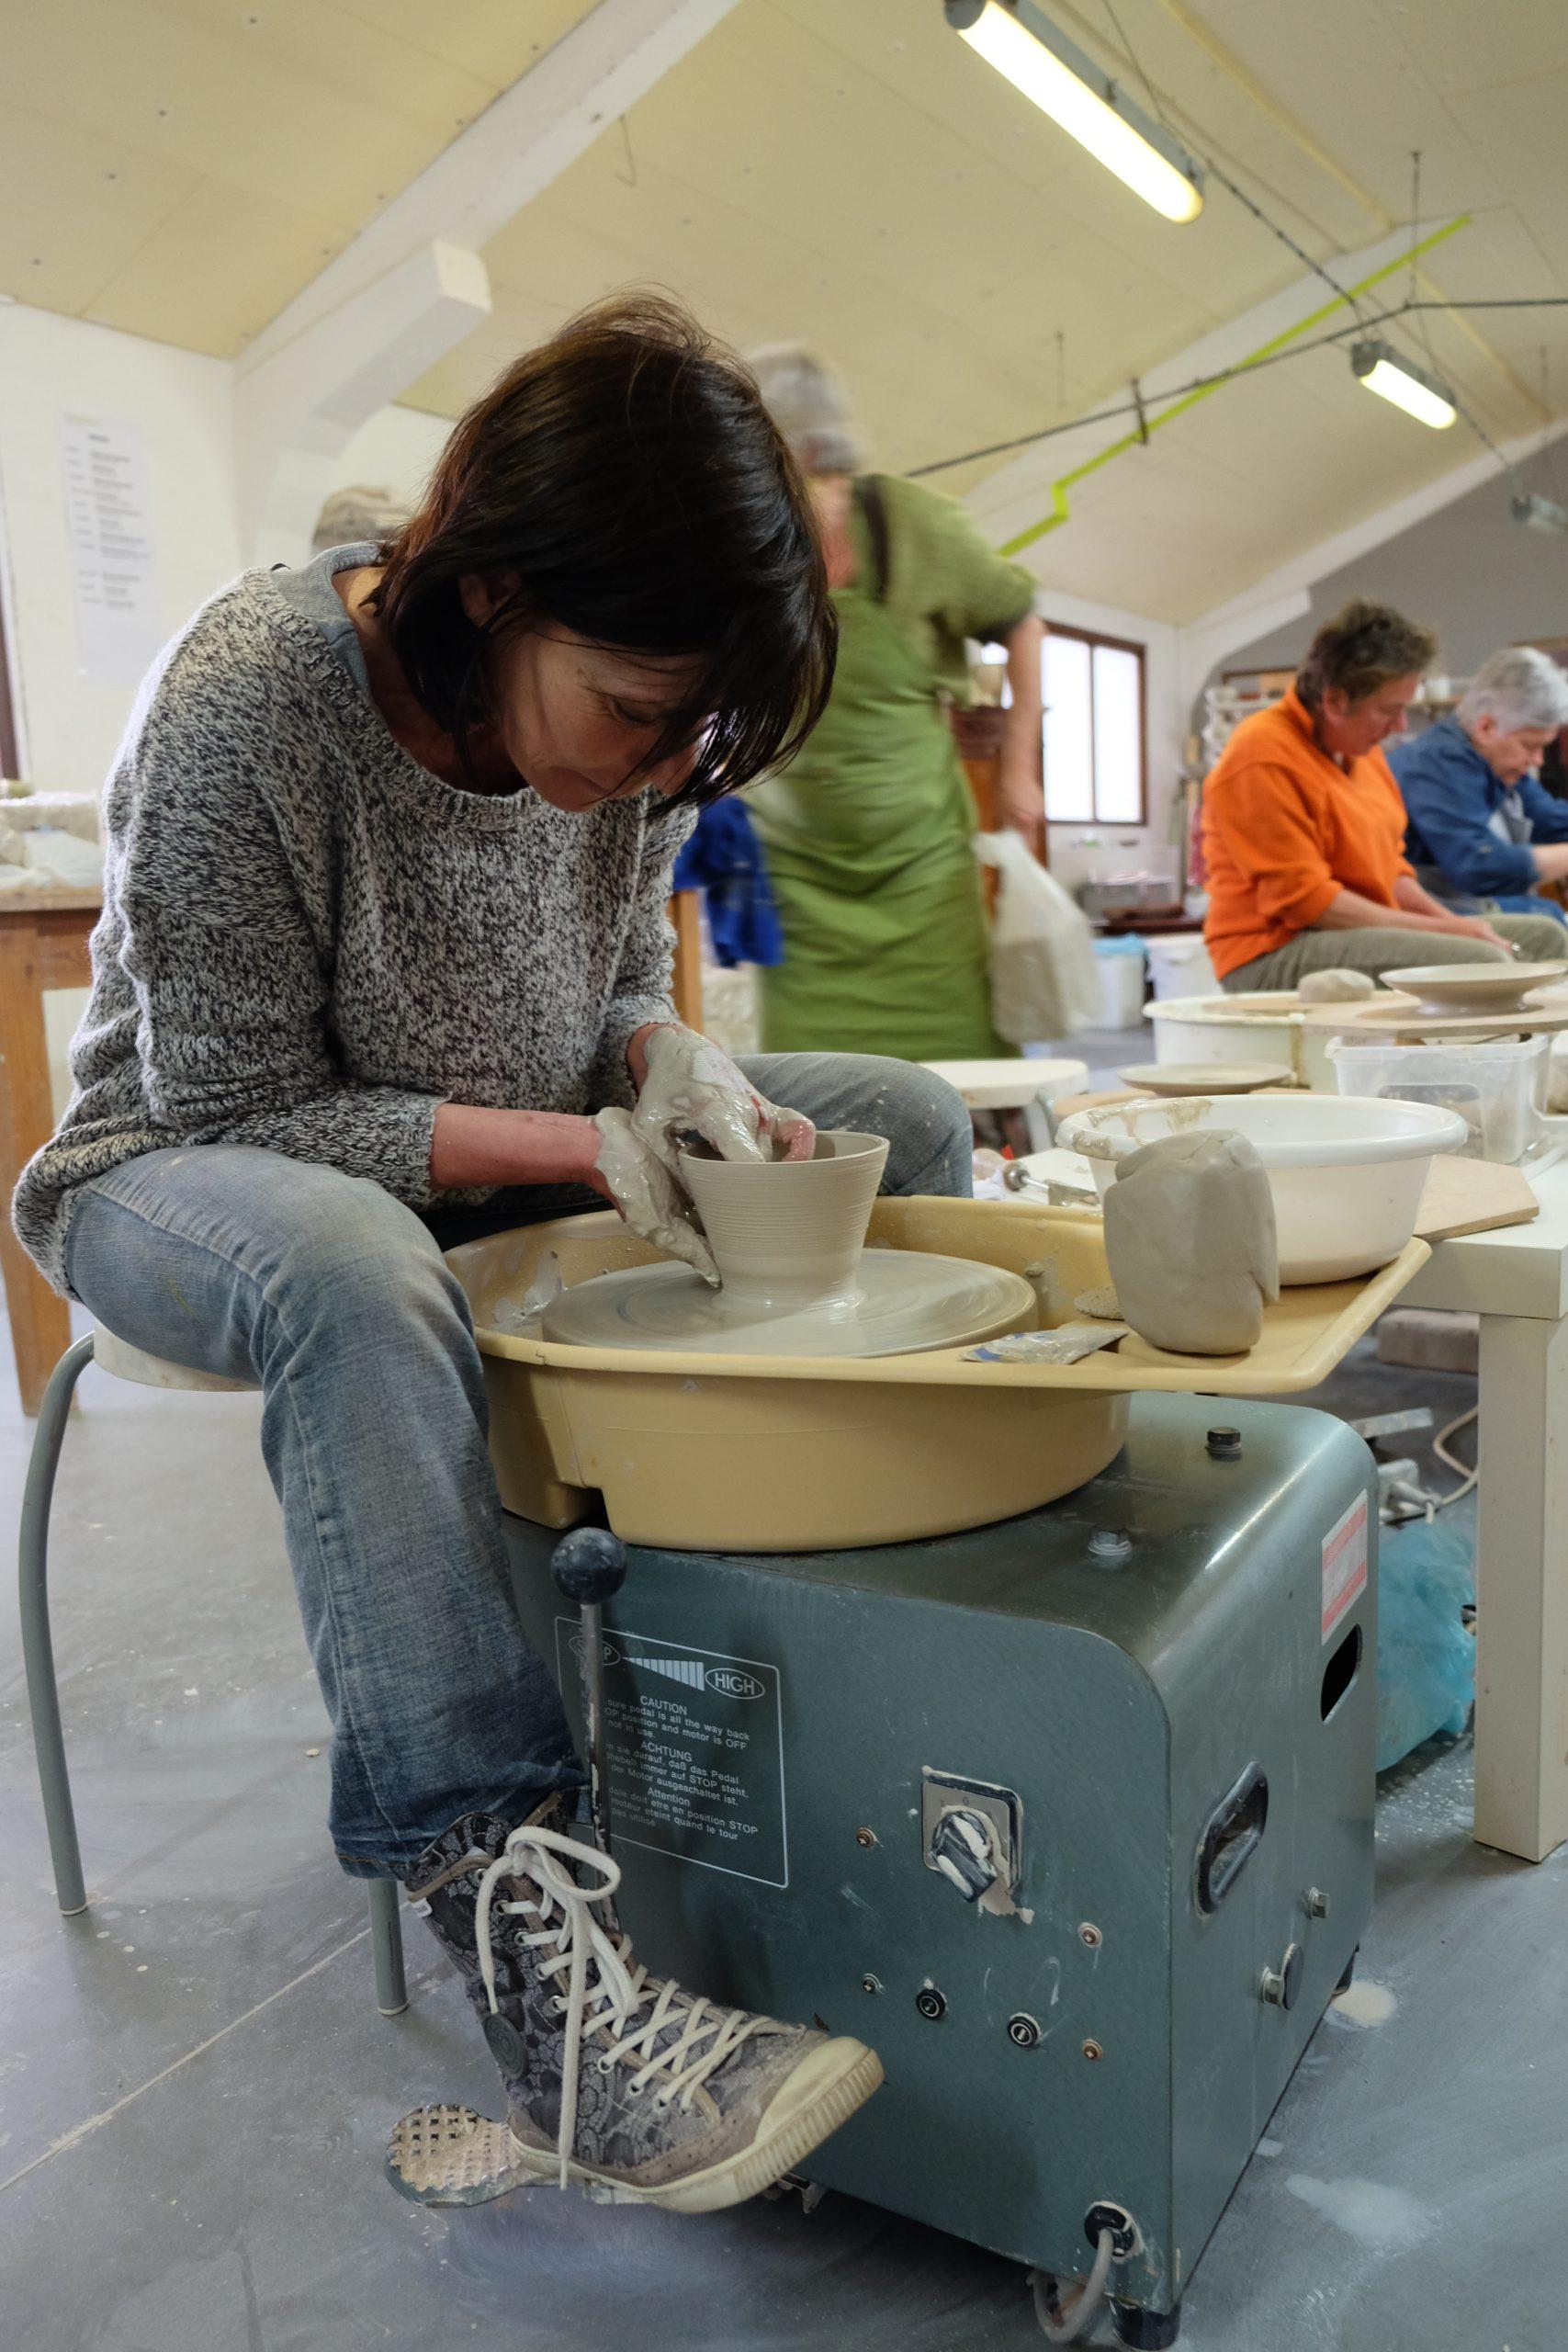 Keramika keramieklessen - pottendraaien